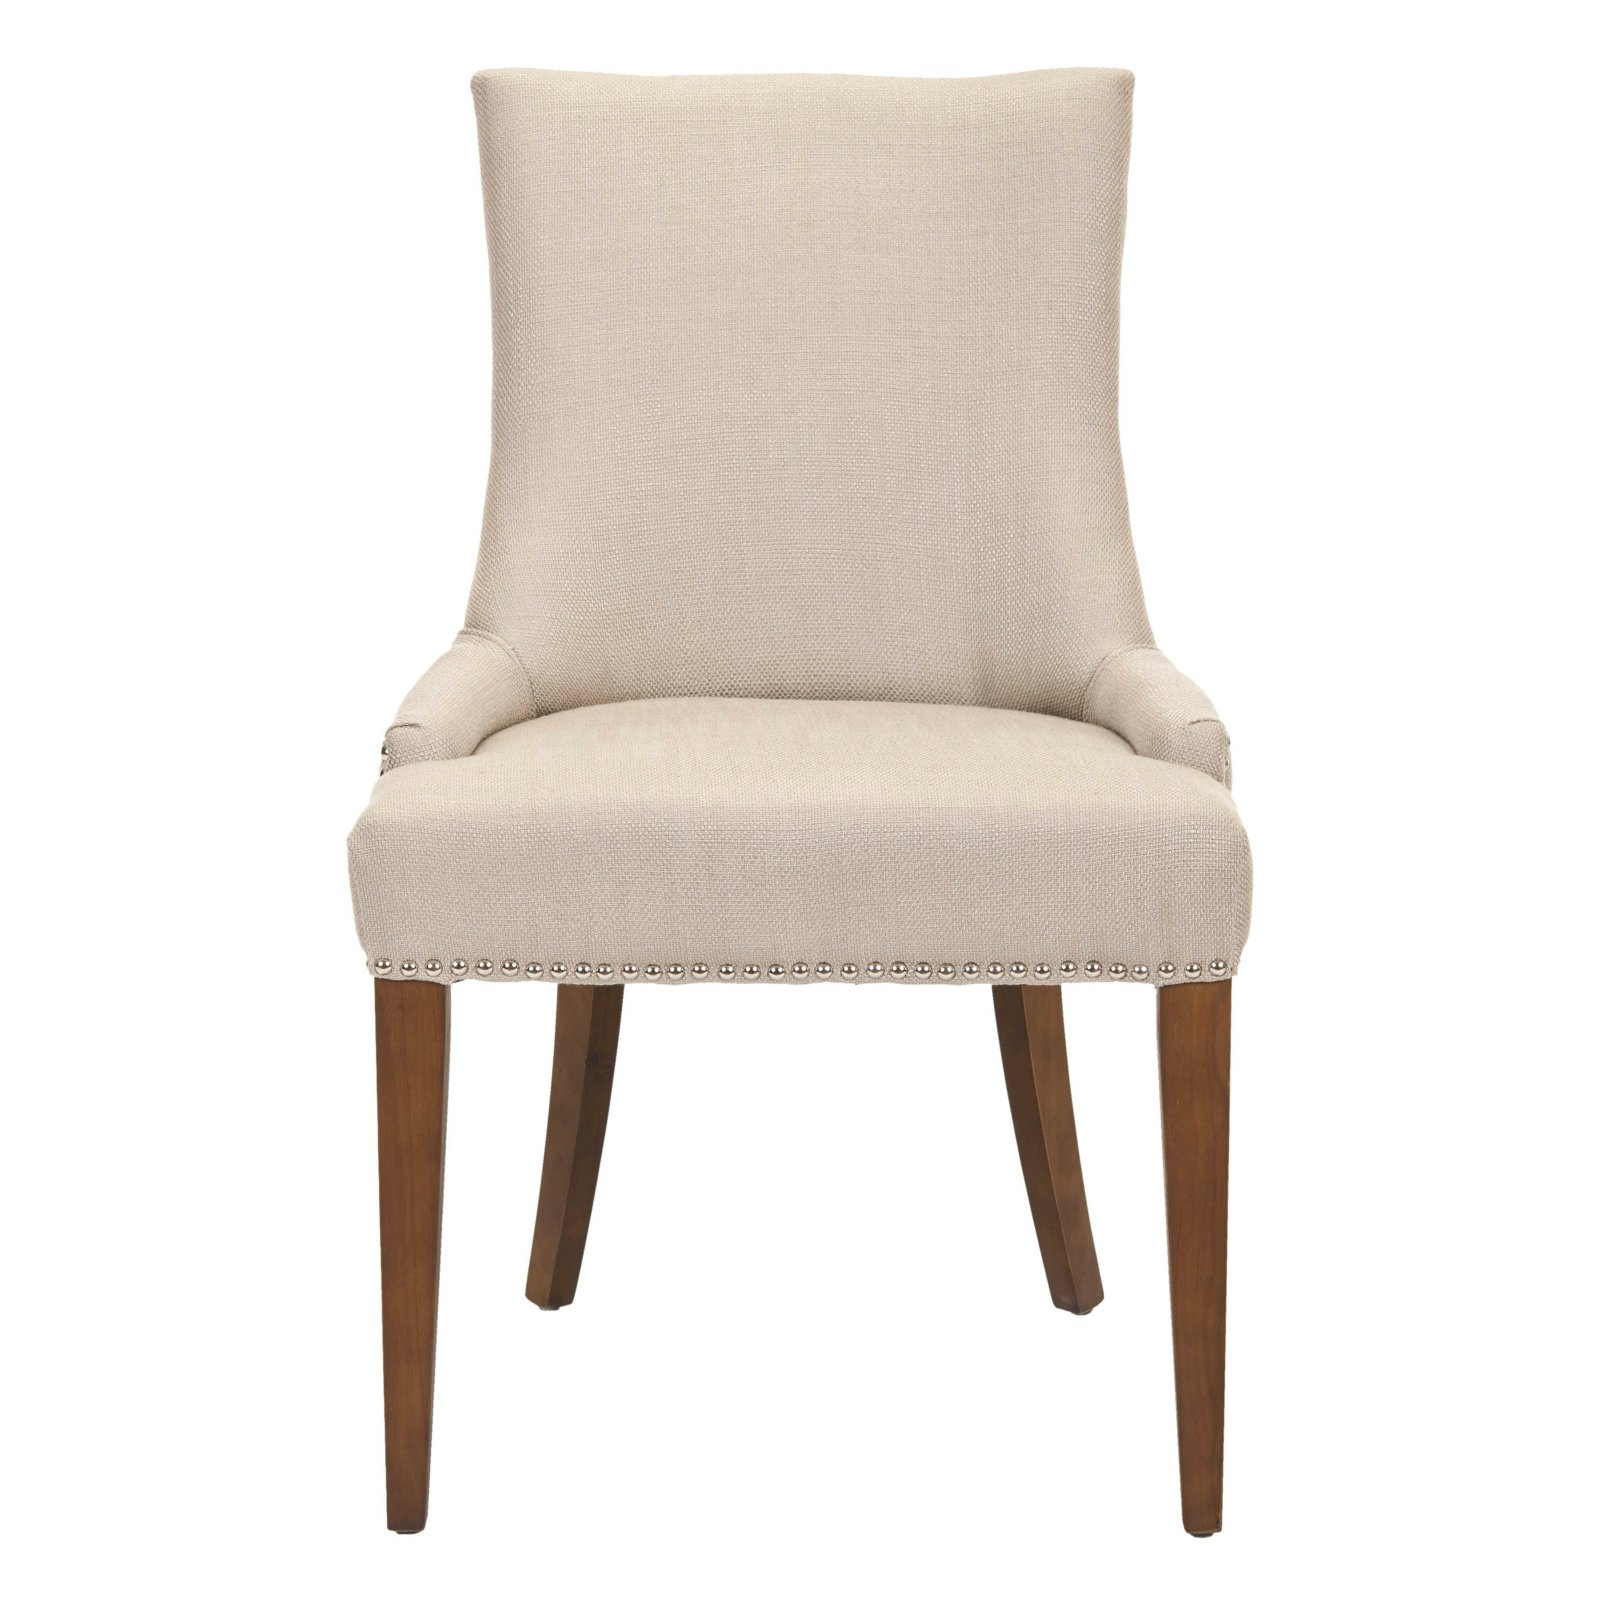 safavieh dining chairs second hand massage for sale alexia fabric chair walnut legs walmart com